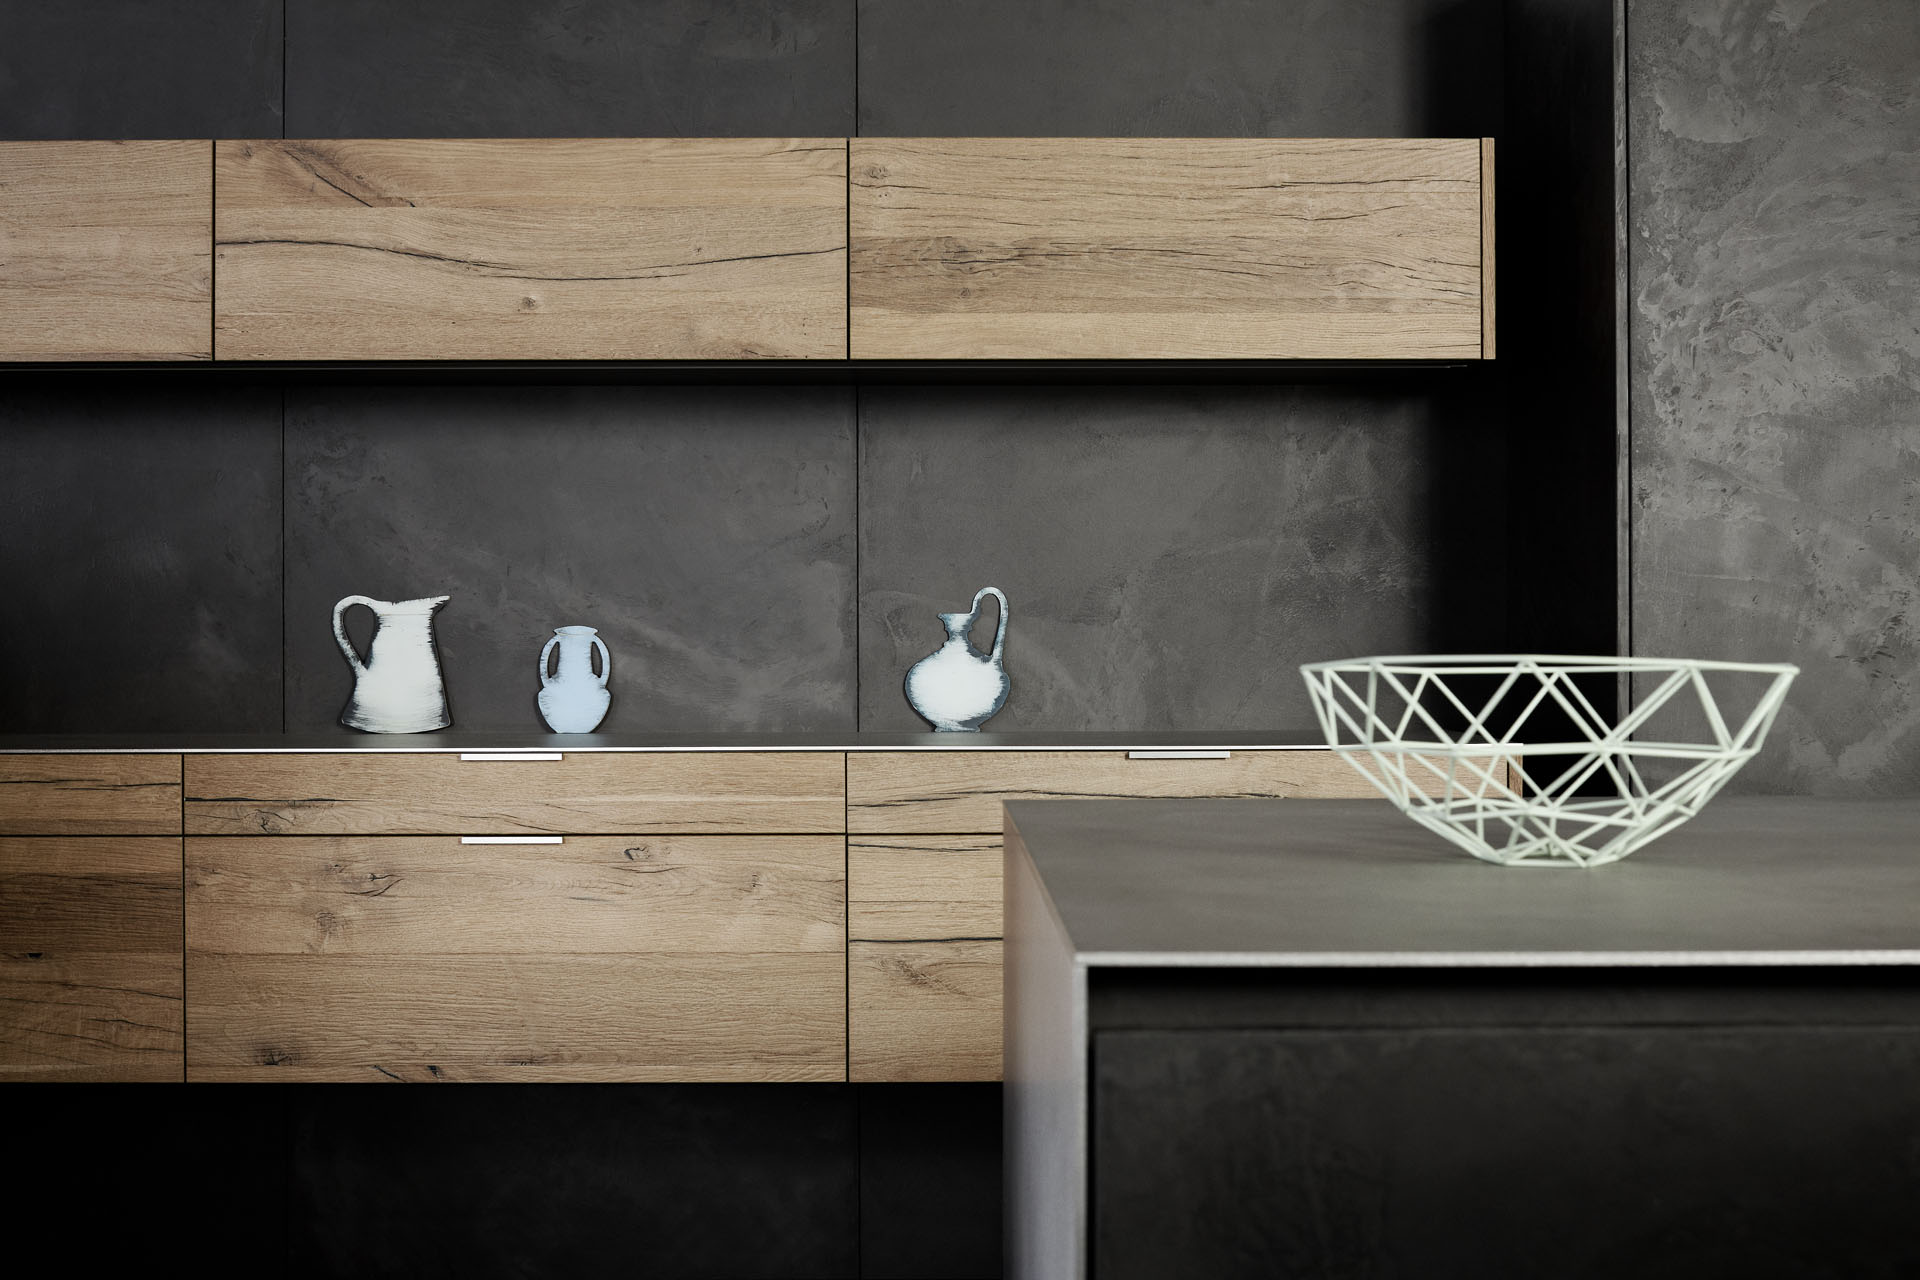 Keuken mat zwart hout: keuken mat of hoogglans. redenen om te kiezen